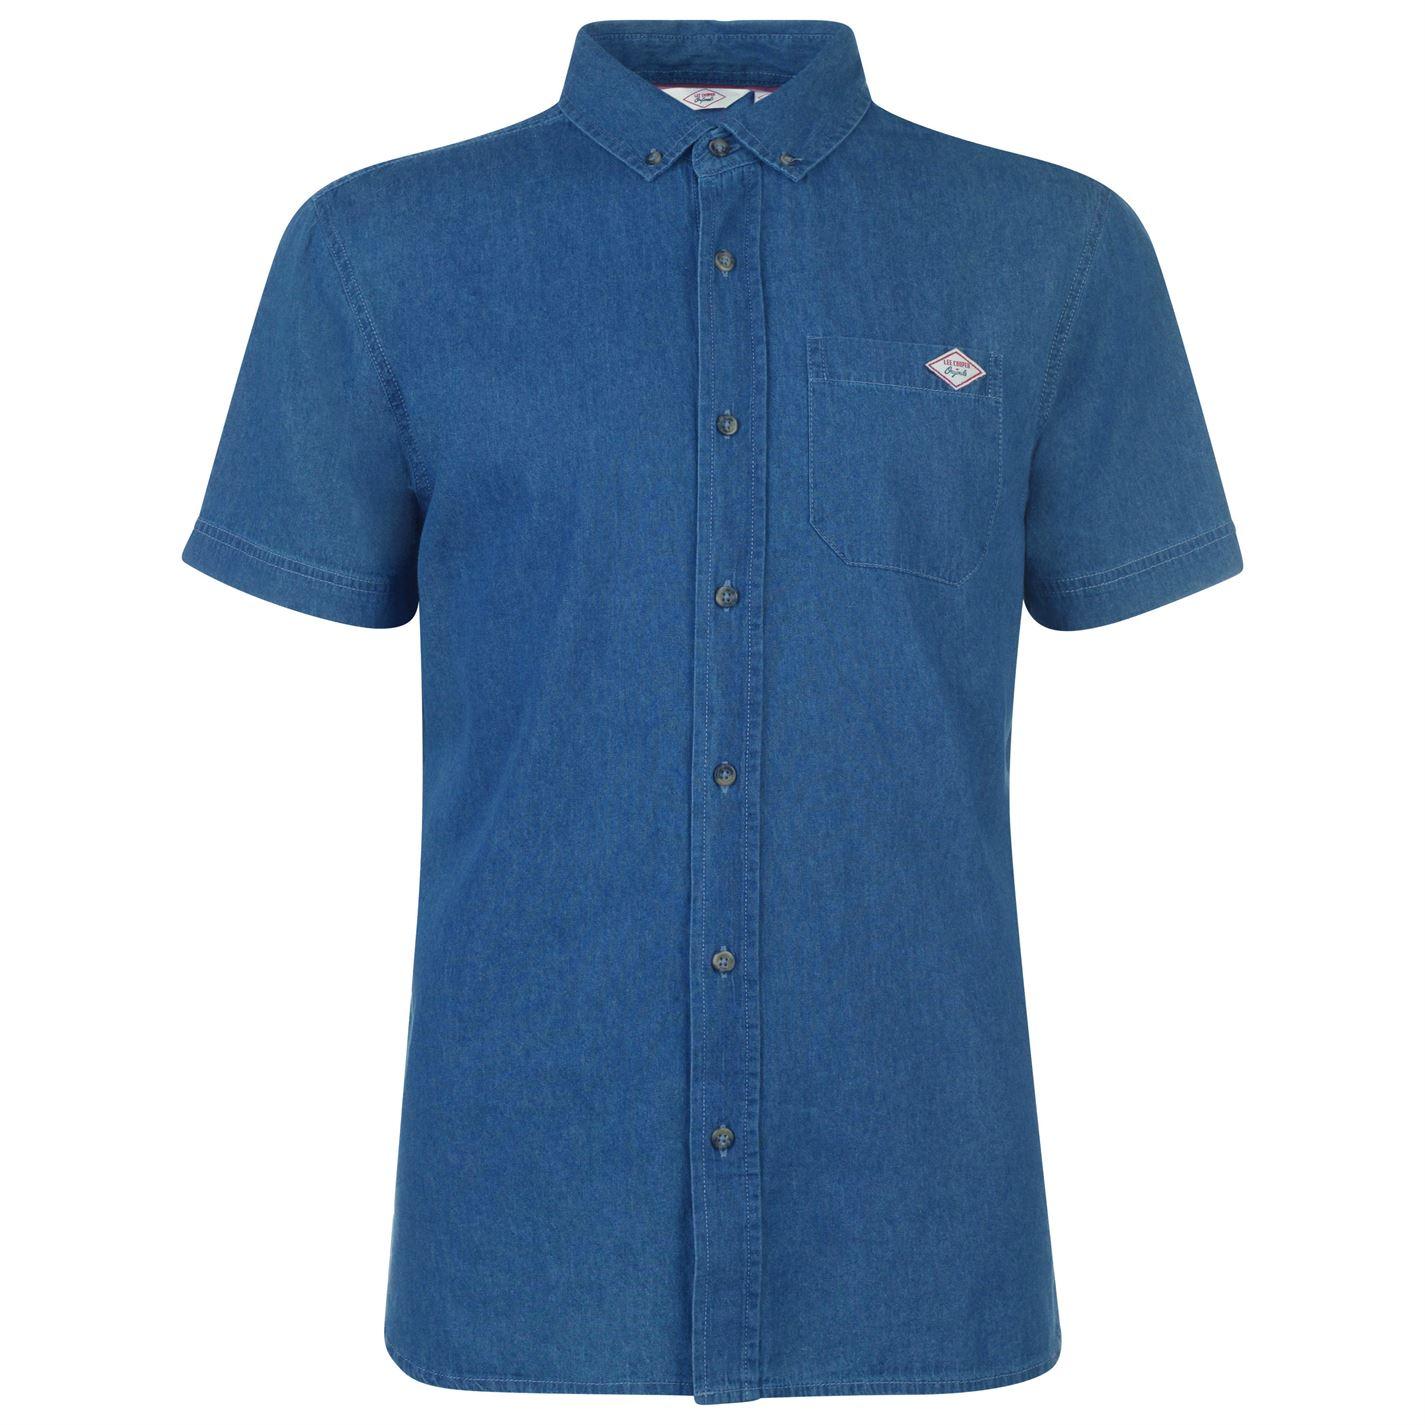 Lee Cooper Short Sleeve Denim Mid Shirt